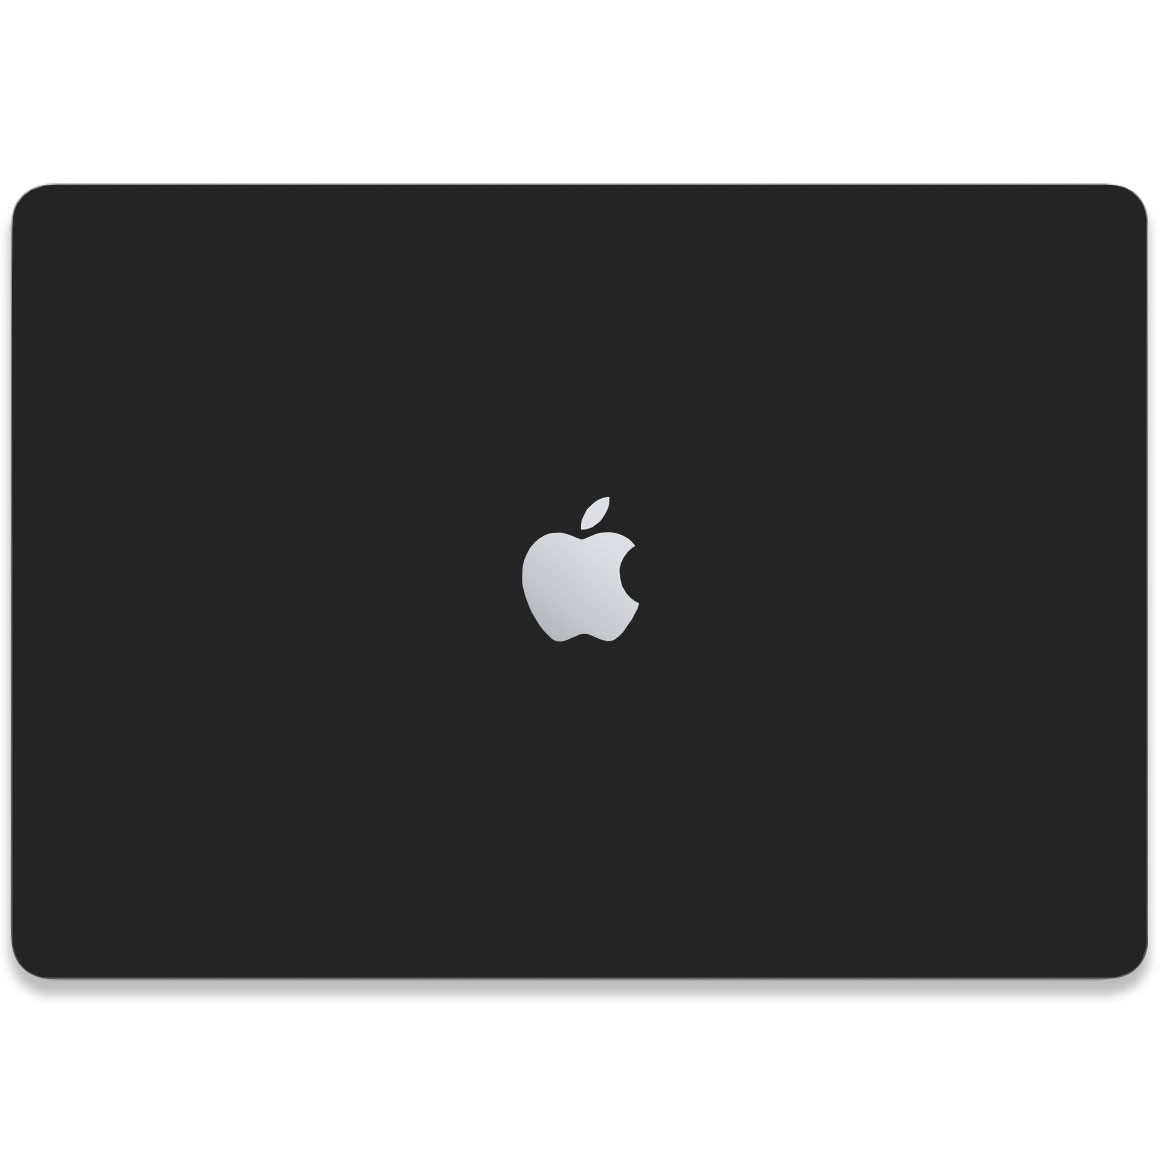 Skin Premium Fosco Liso Para Macbook Pro 13 M1 A2338